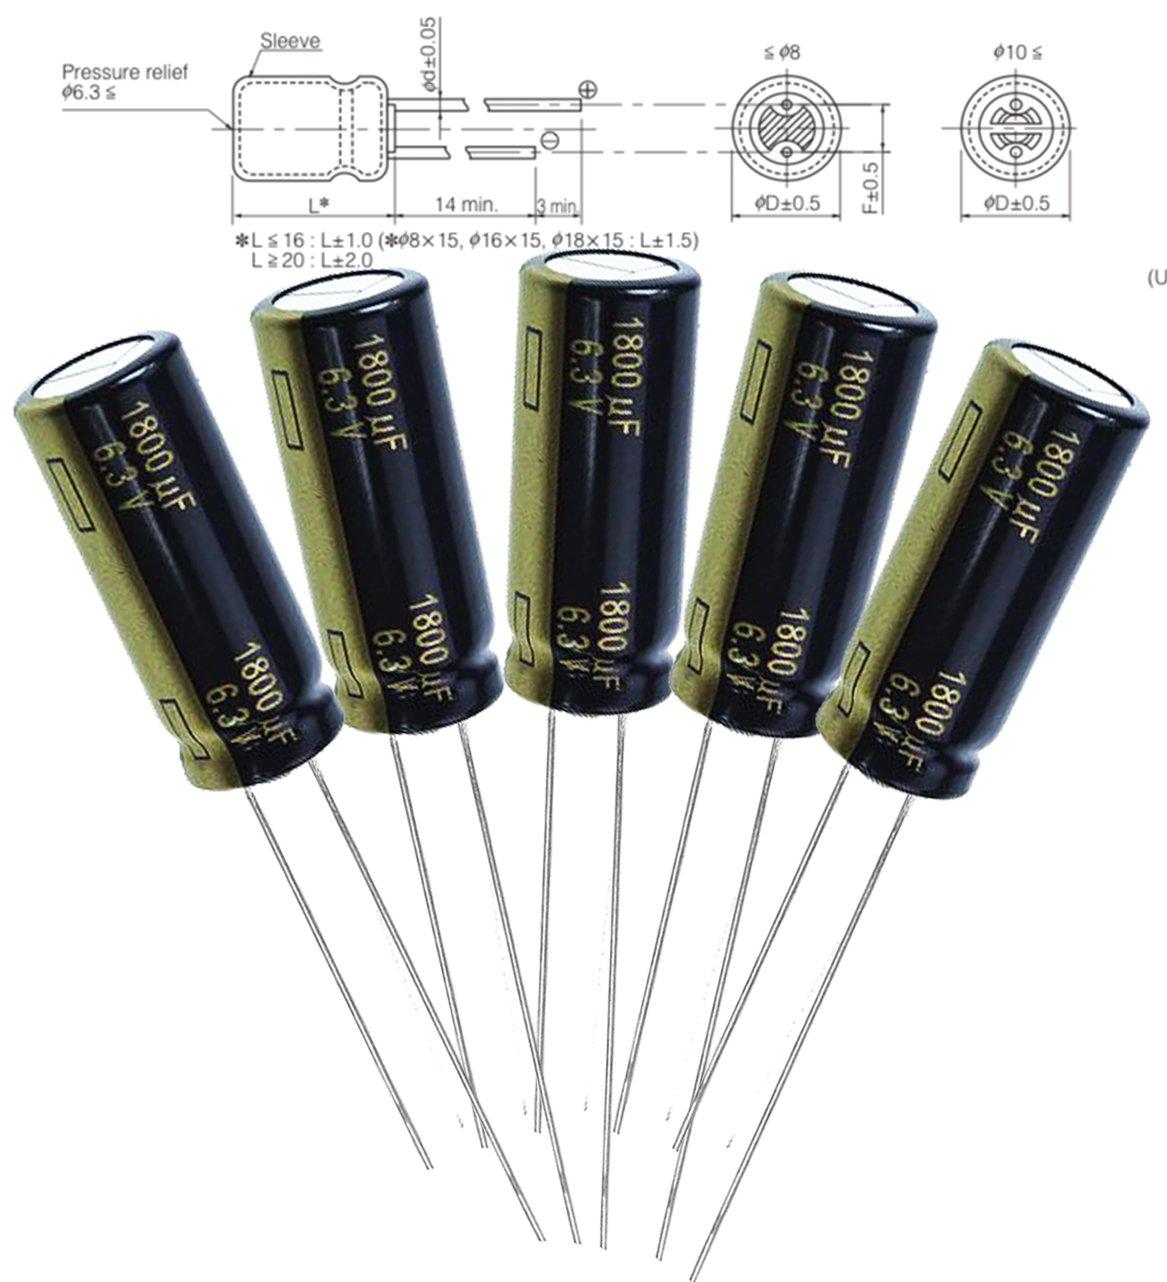 100P Original Rubycon MCZ 1800uF 6.3v 105c Radial Electrolytic Capacitor Low ESR